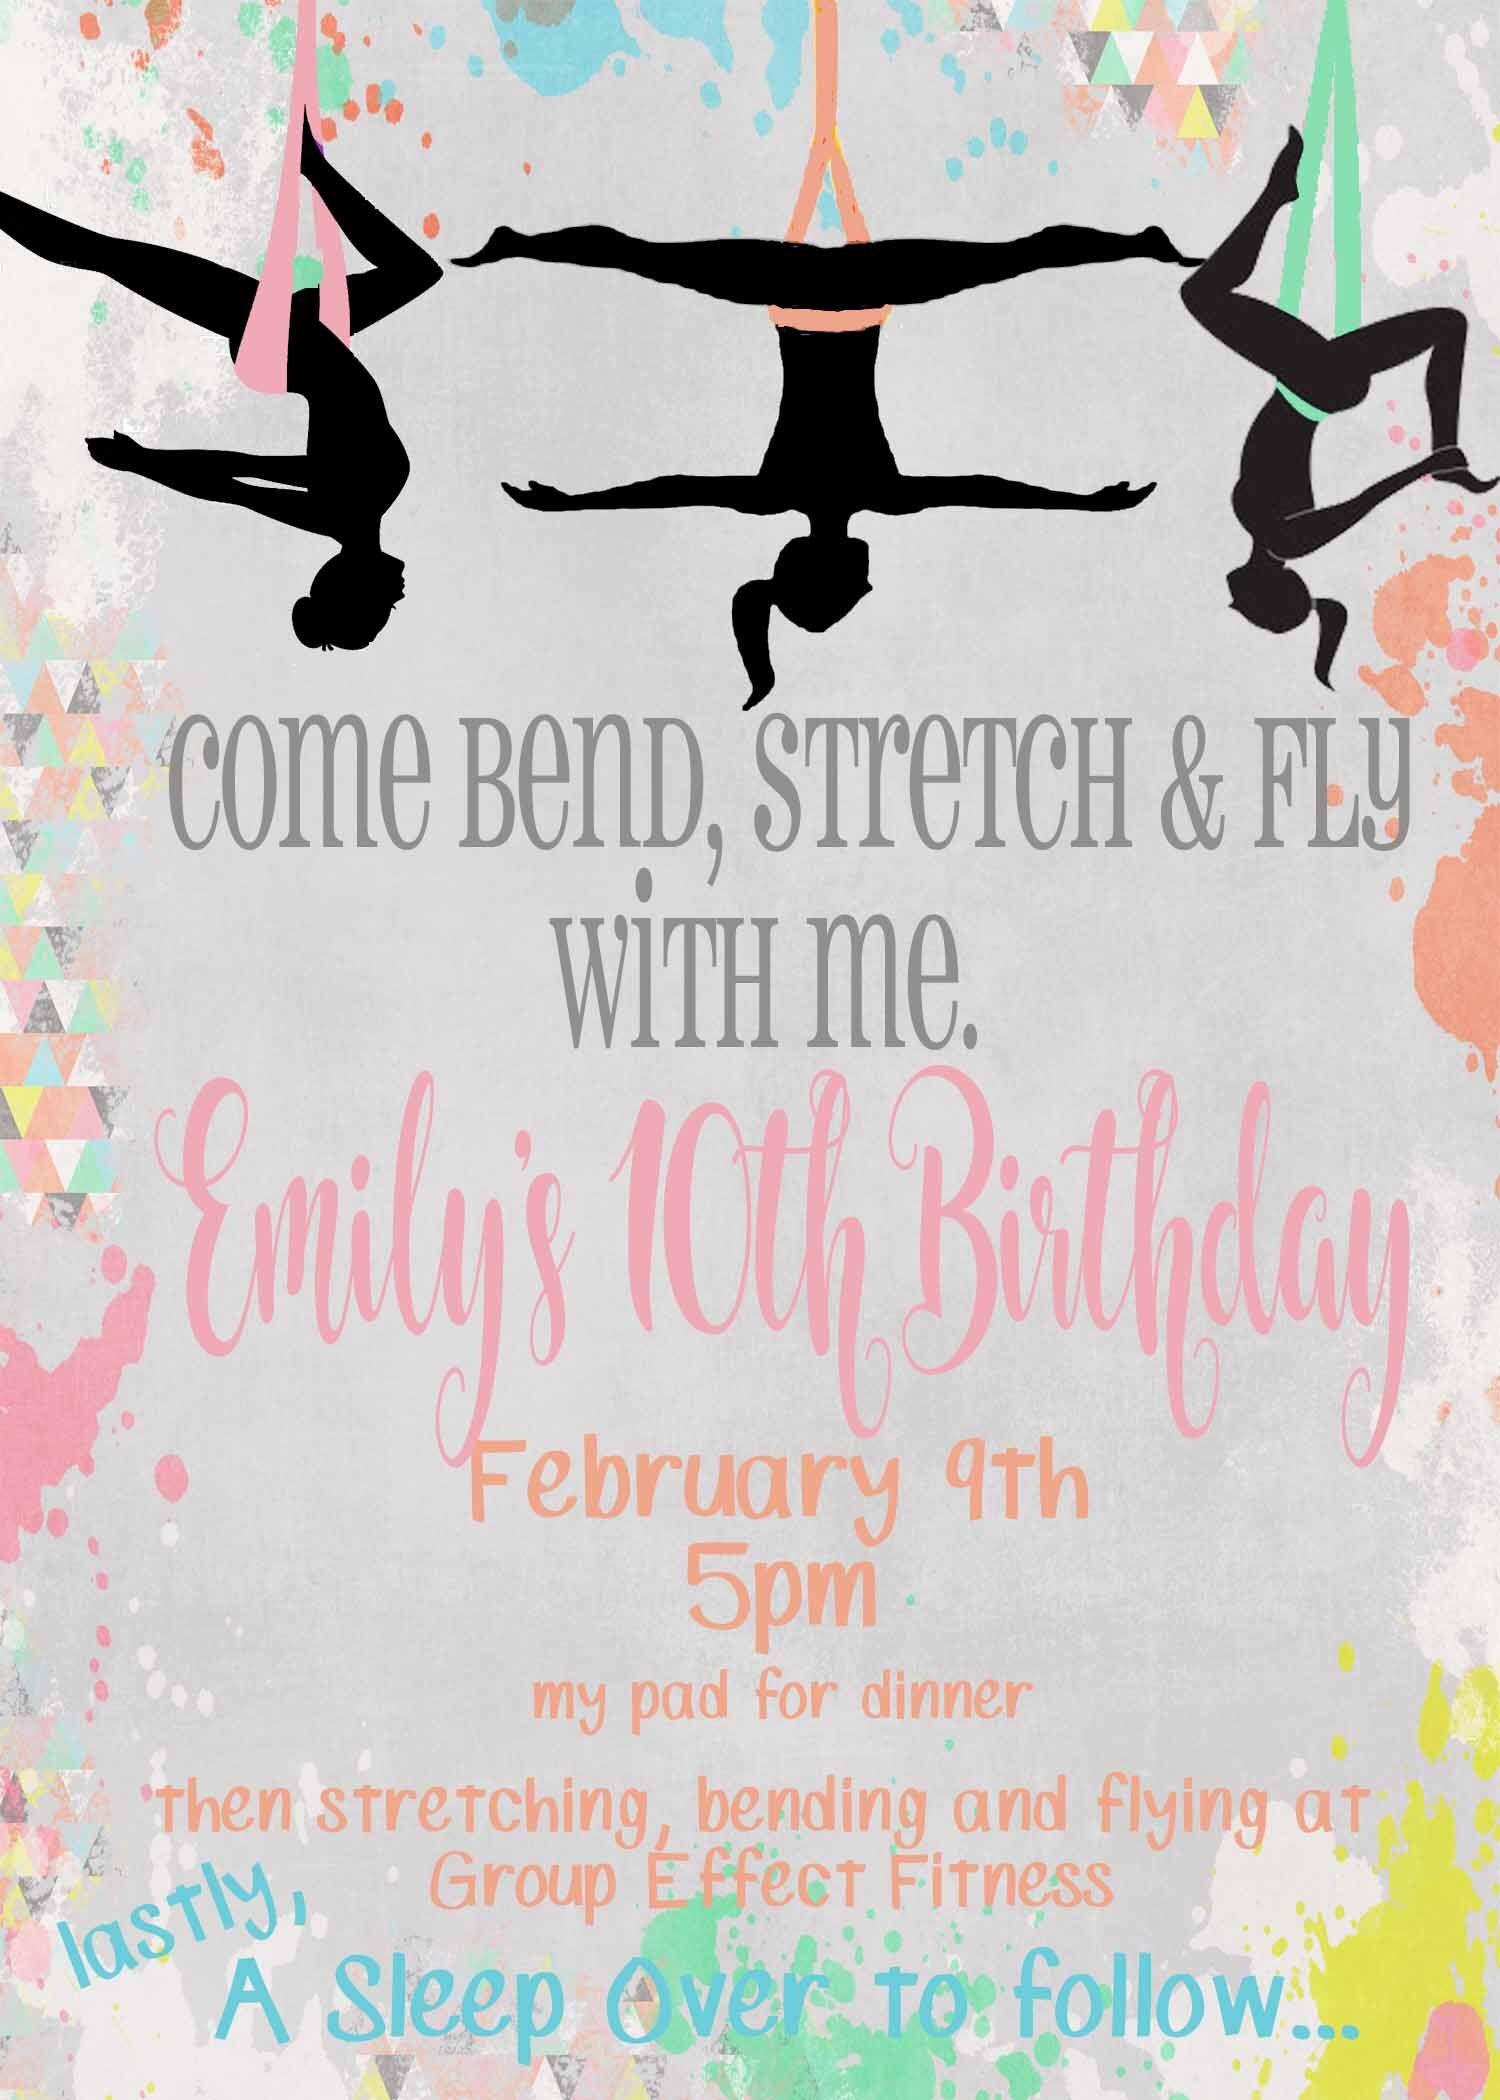 Aerial Yoga Birthday Invitation By 4jevos On Etsy Https Www Etsy Com Listing 576728418 Aerial Yoga Birthday Invit Yoga Party Birthday Invitations Aerial Yoga